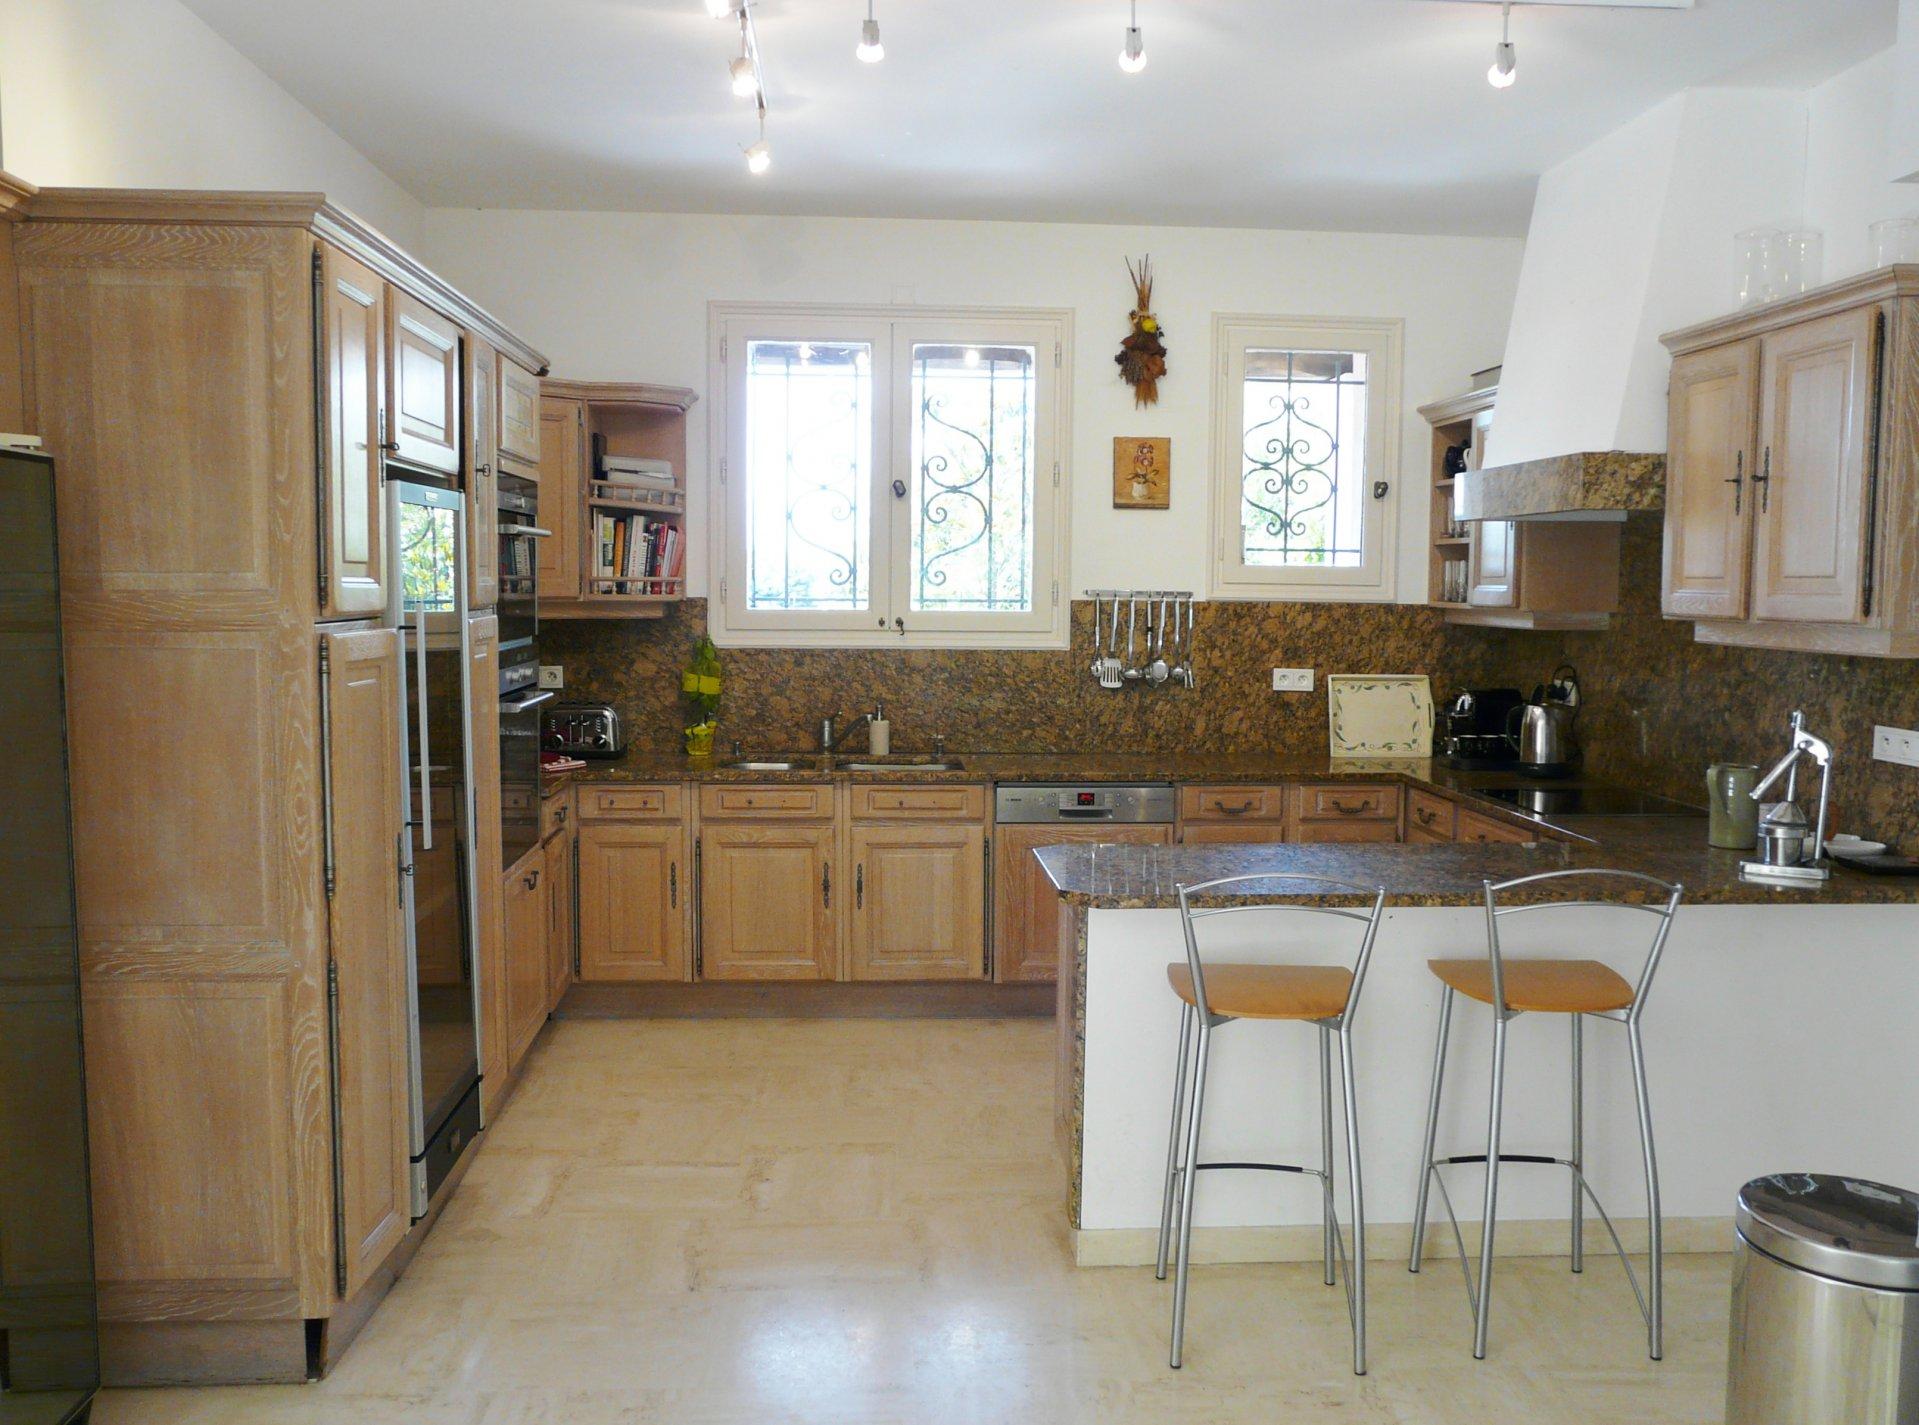 Kitchen, natural light, stainless steel, kitchen bar